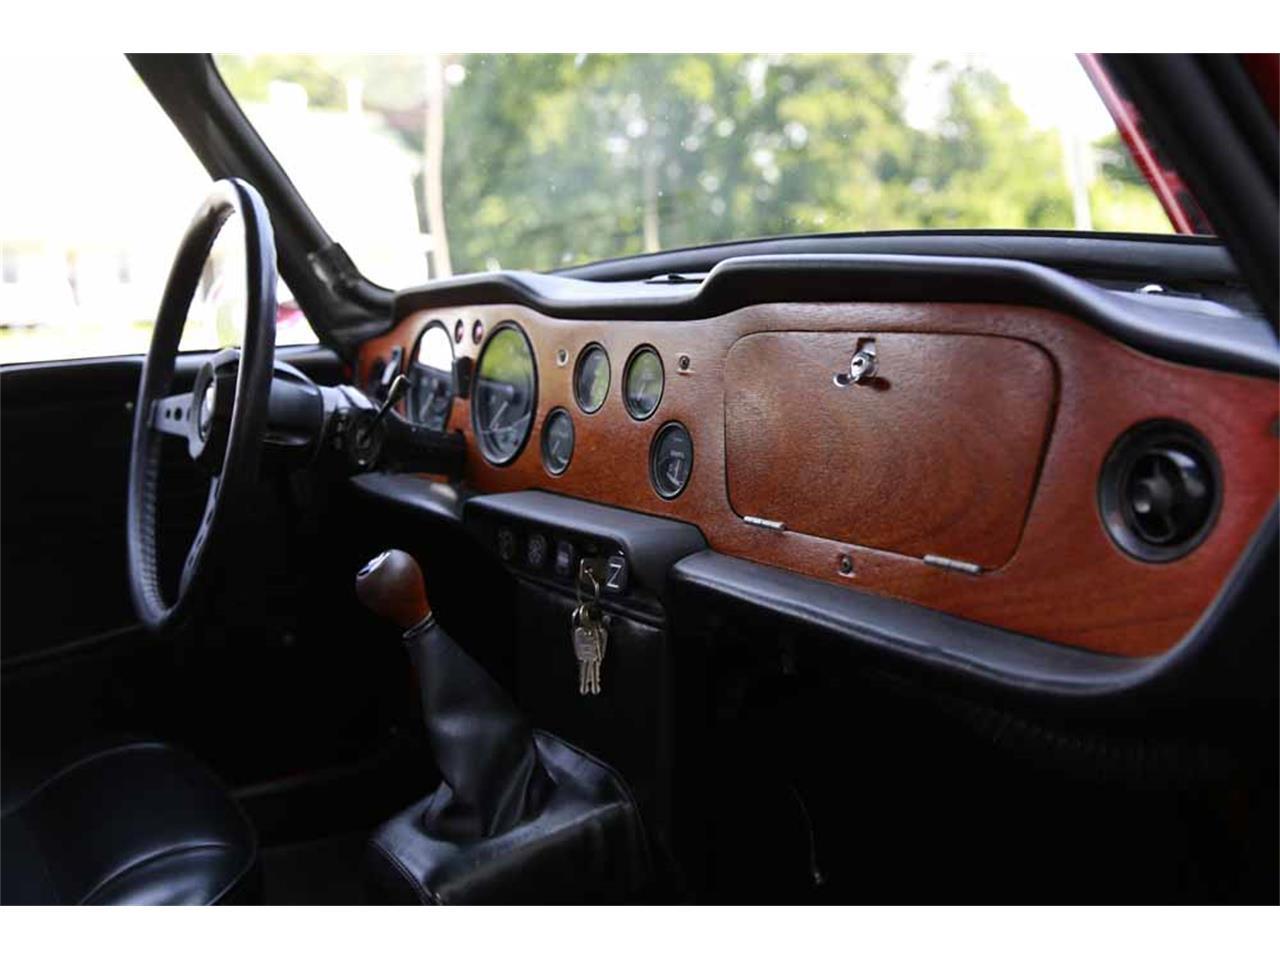 Large Picture of 1969 Triumph TR6 located in Waynesboro Virginia - J14Z